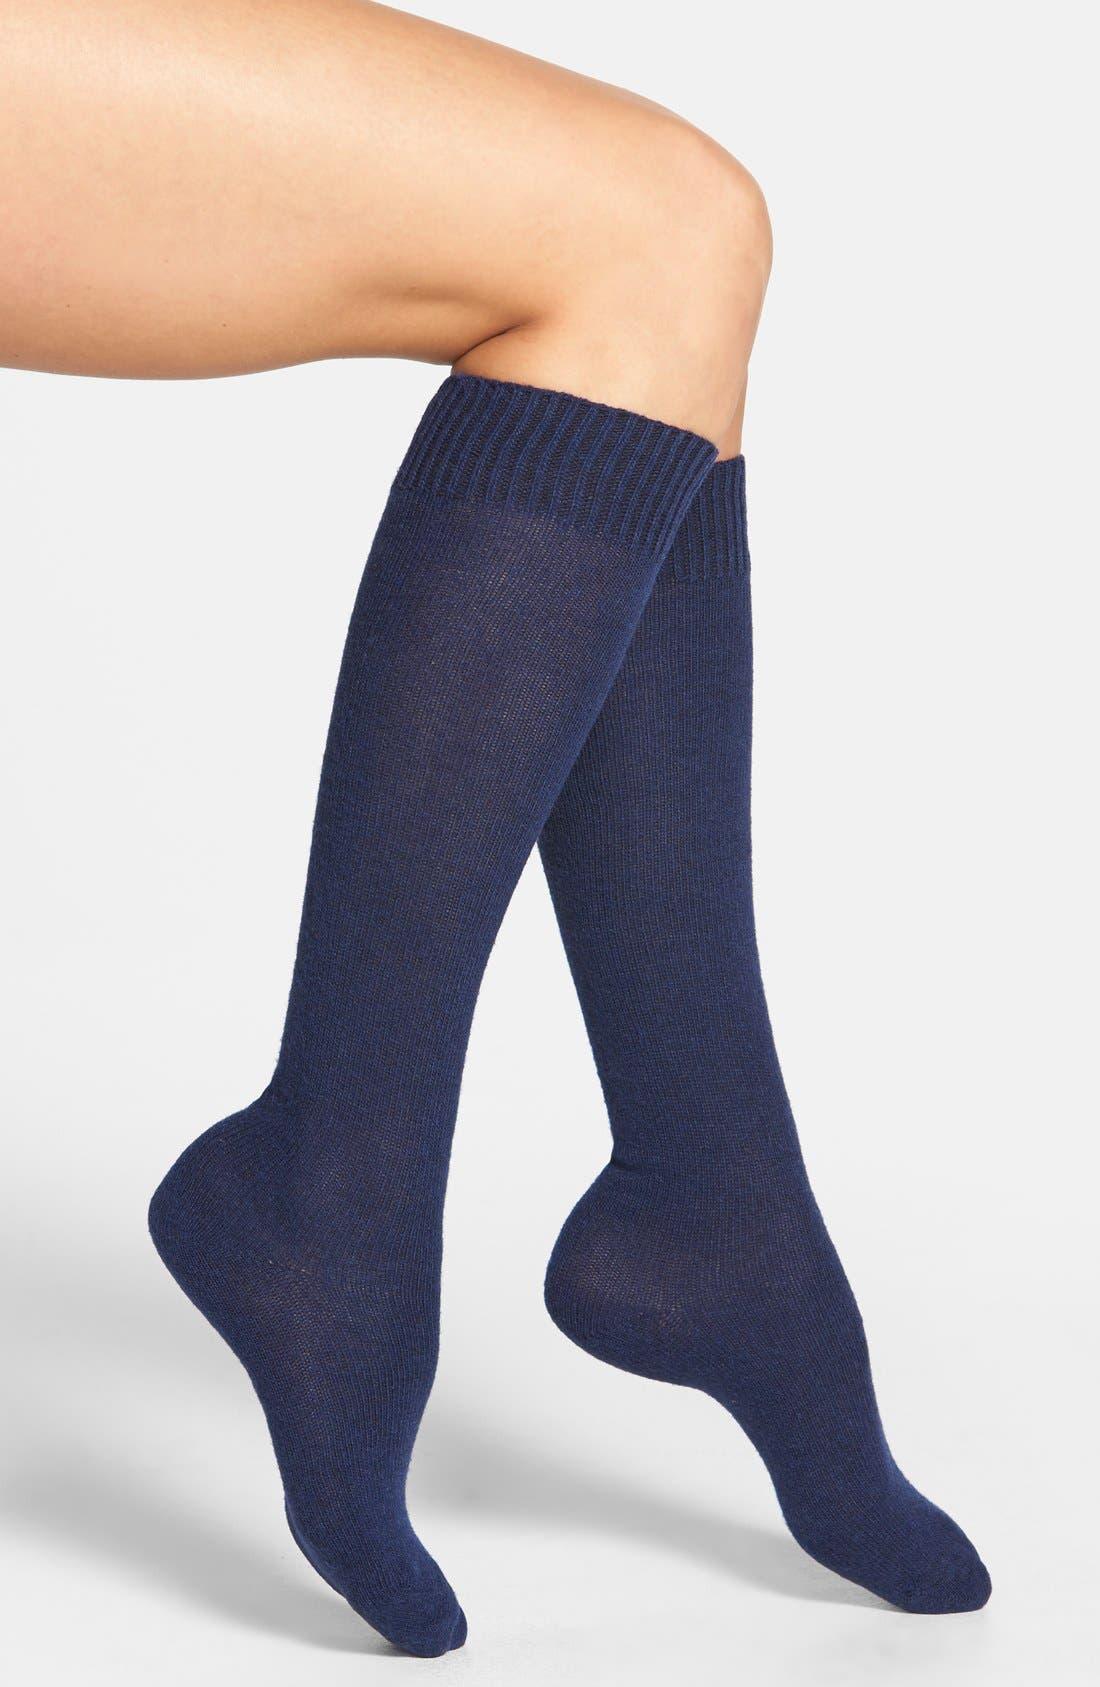 Alternate Image 1 Selected - Nordstrom Knee High Socks